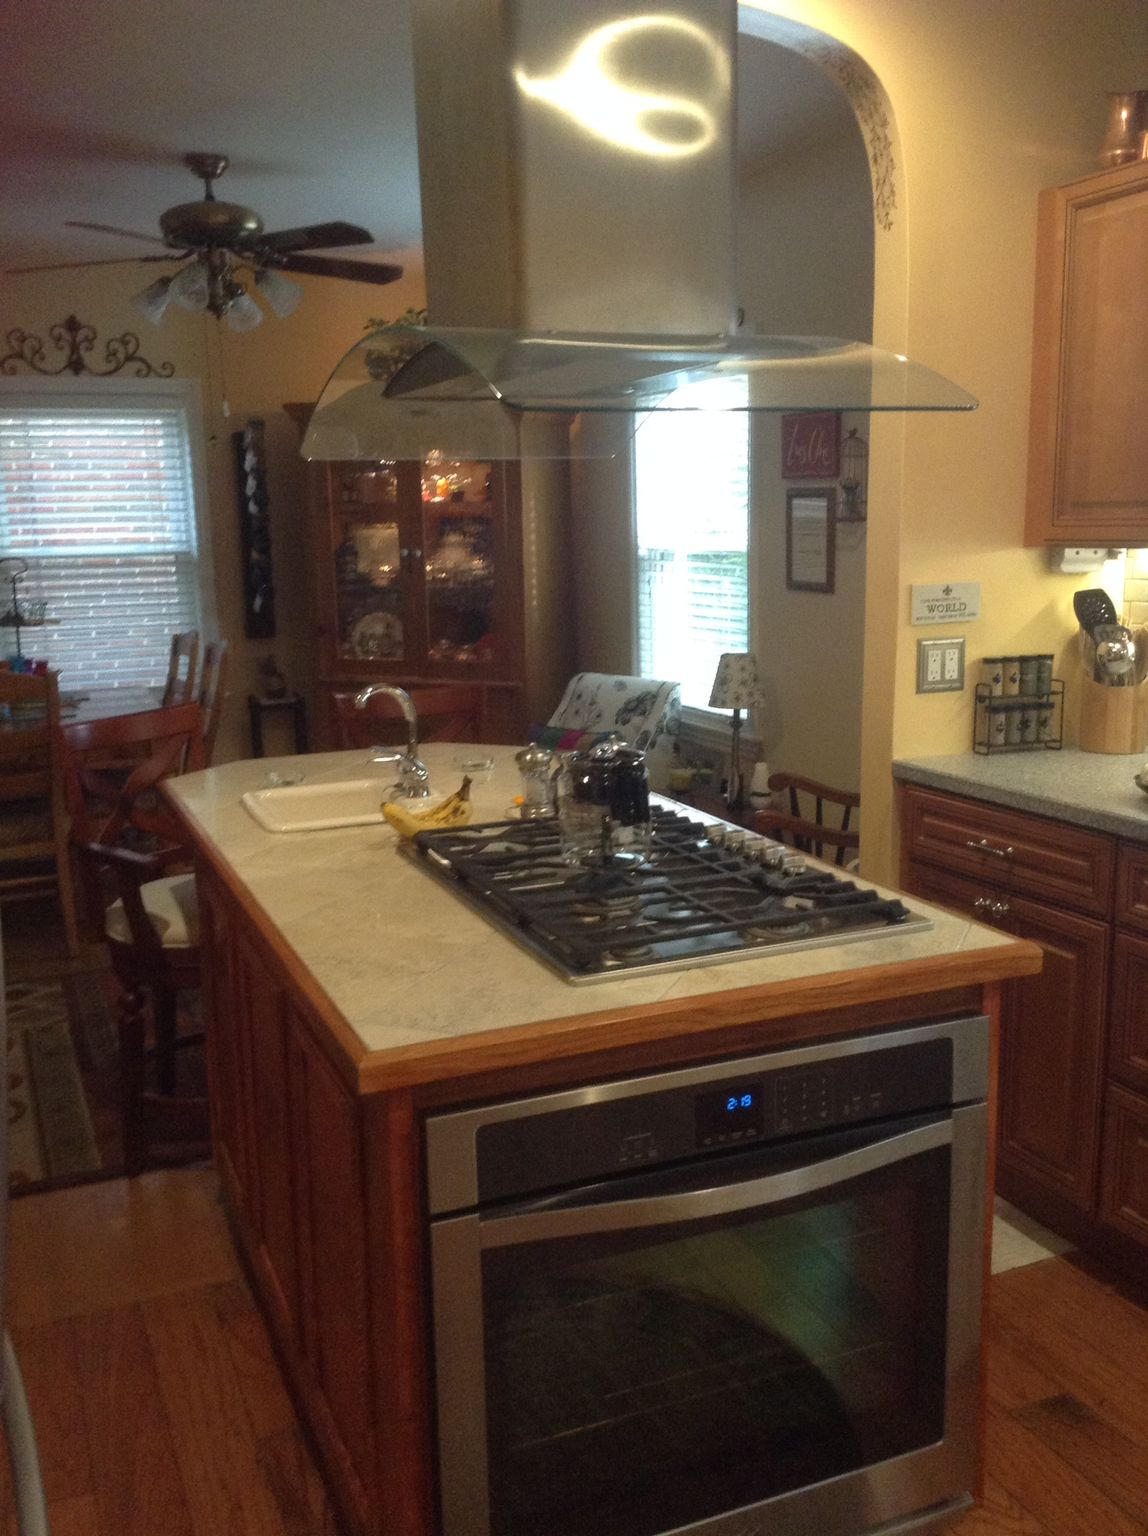 421 10th Ave For Sale - Huntington, WV | Trulia